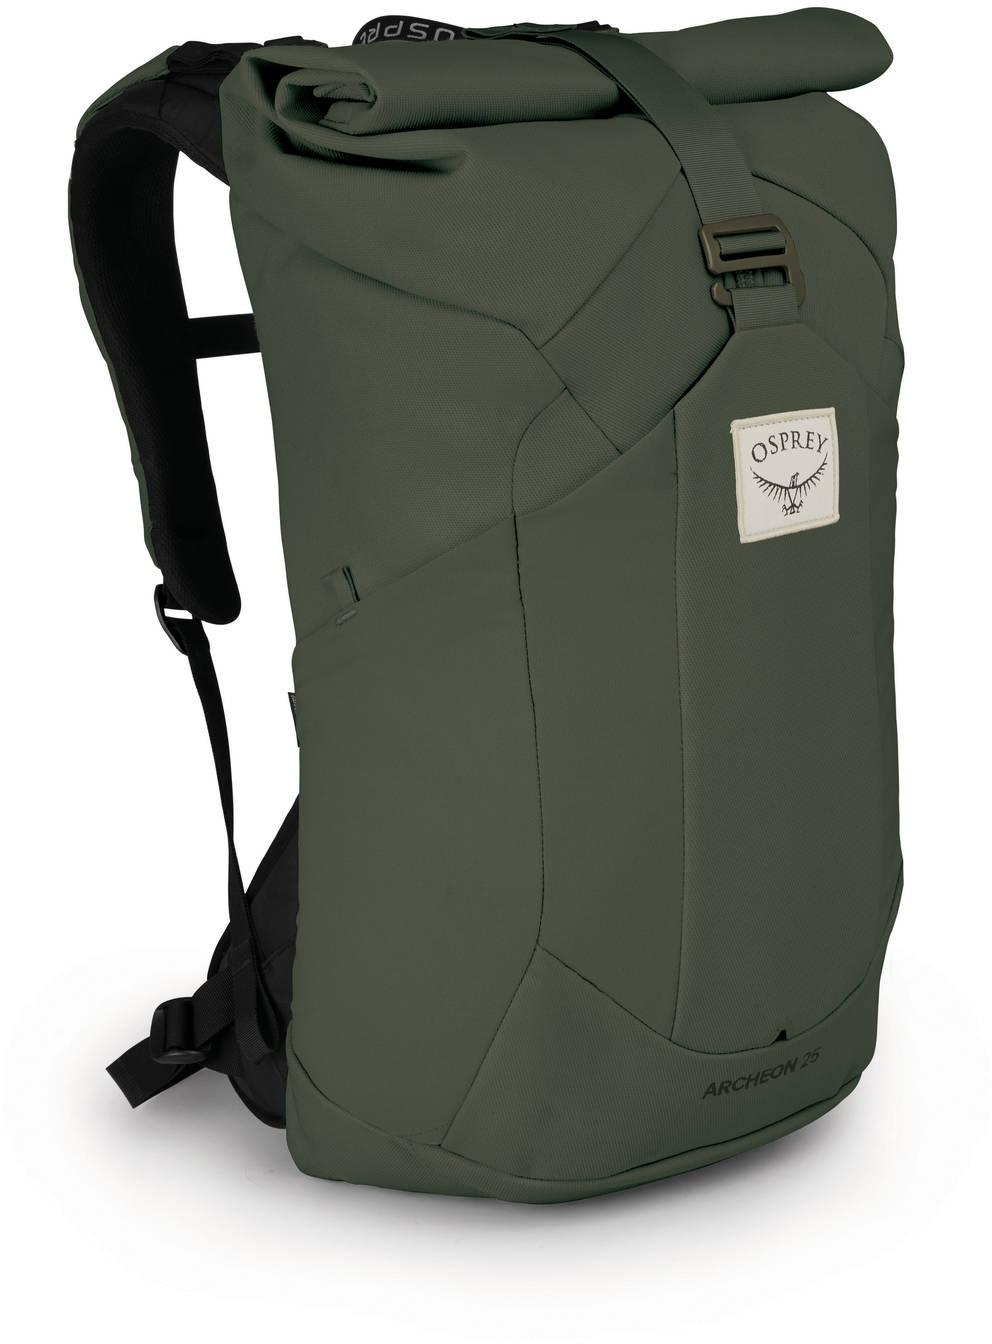 Городские рюкзаки Рюкзак Osprey Archeon 25 M's Haybale Green Archeon_M_25_S20_Side_Haybale_Green_web.jpg